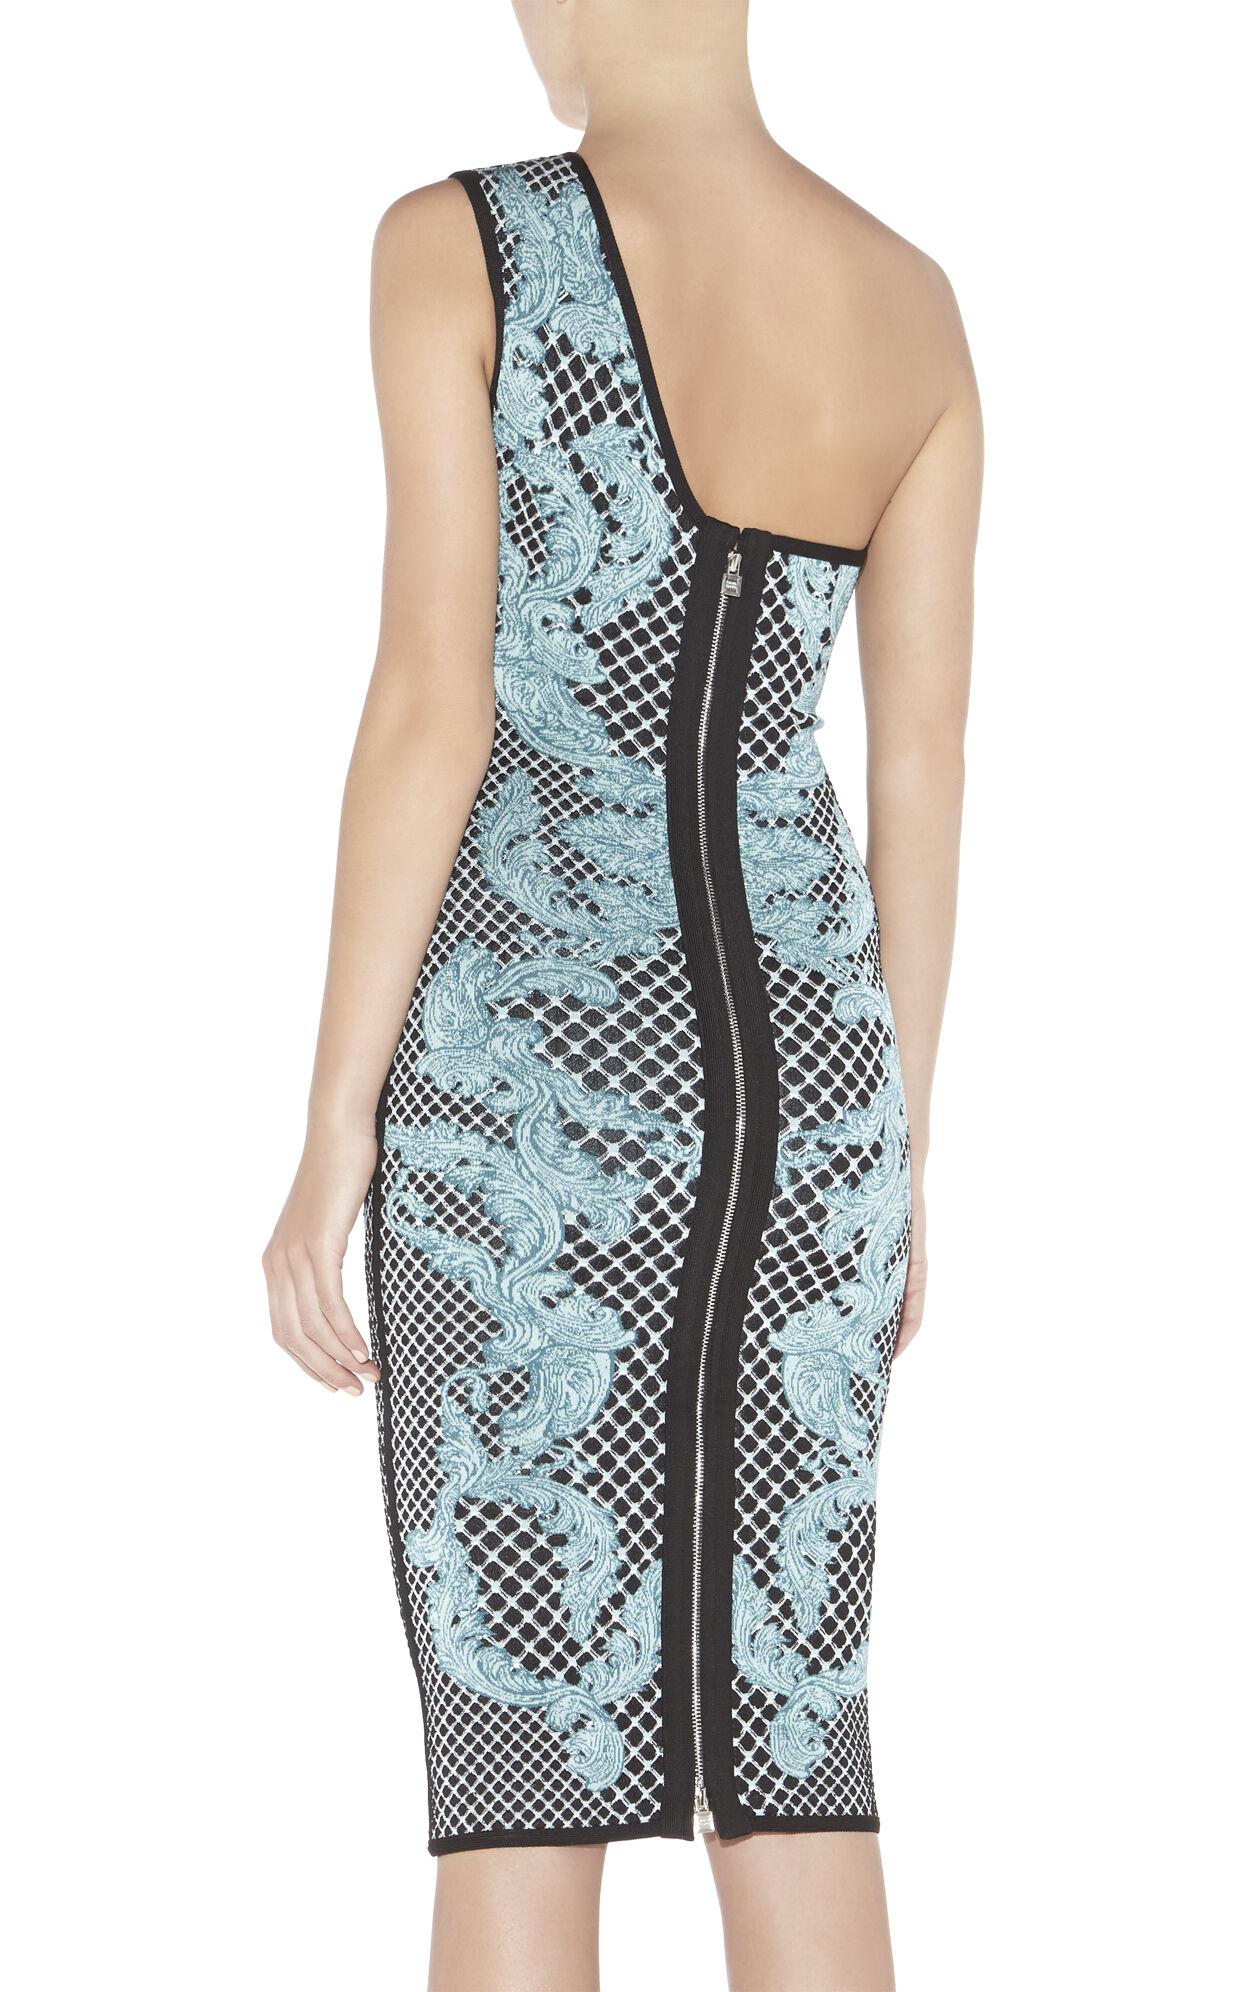 Victoria HL Monogram Crescent Jacquard Dress